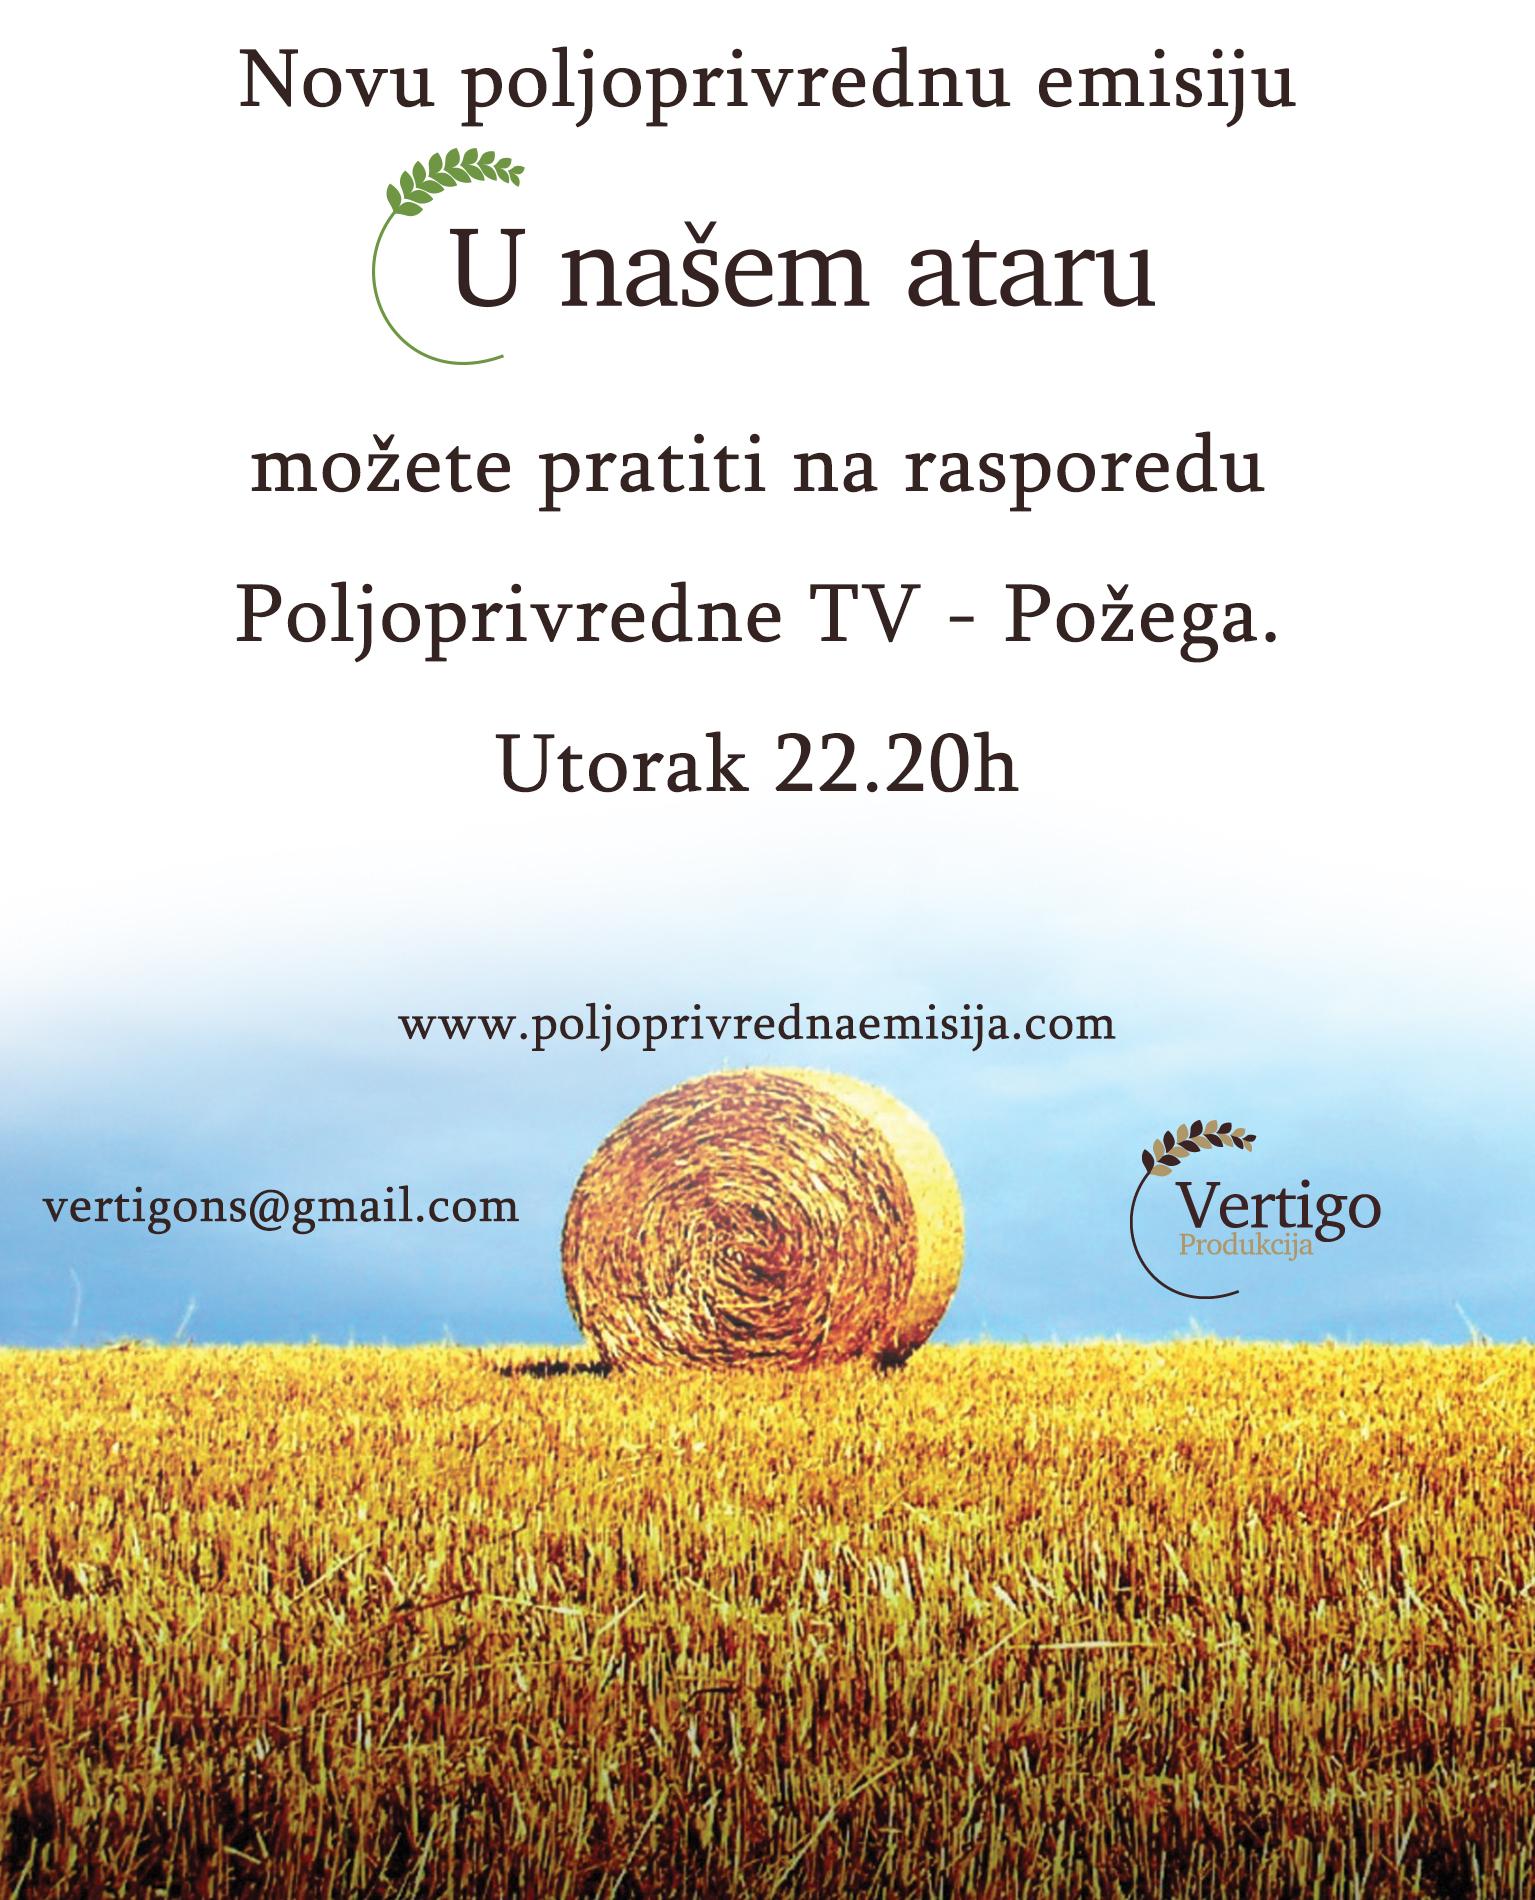 Nova poljoprivredna emisija